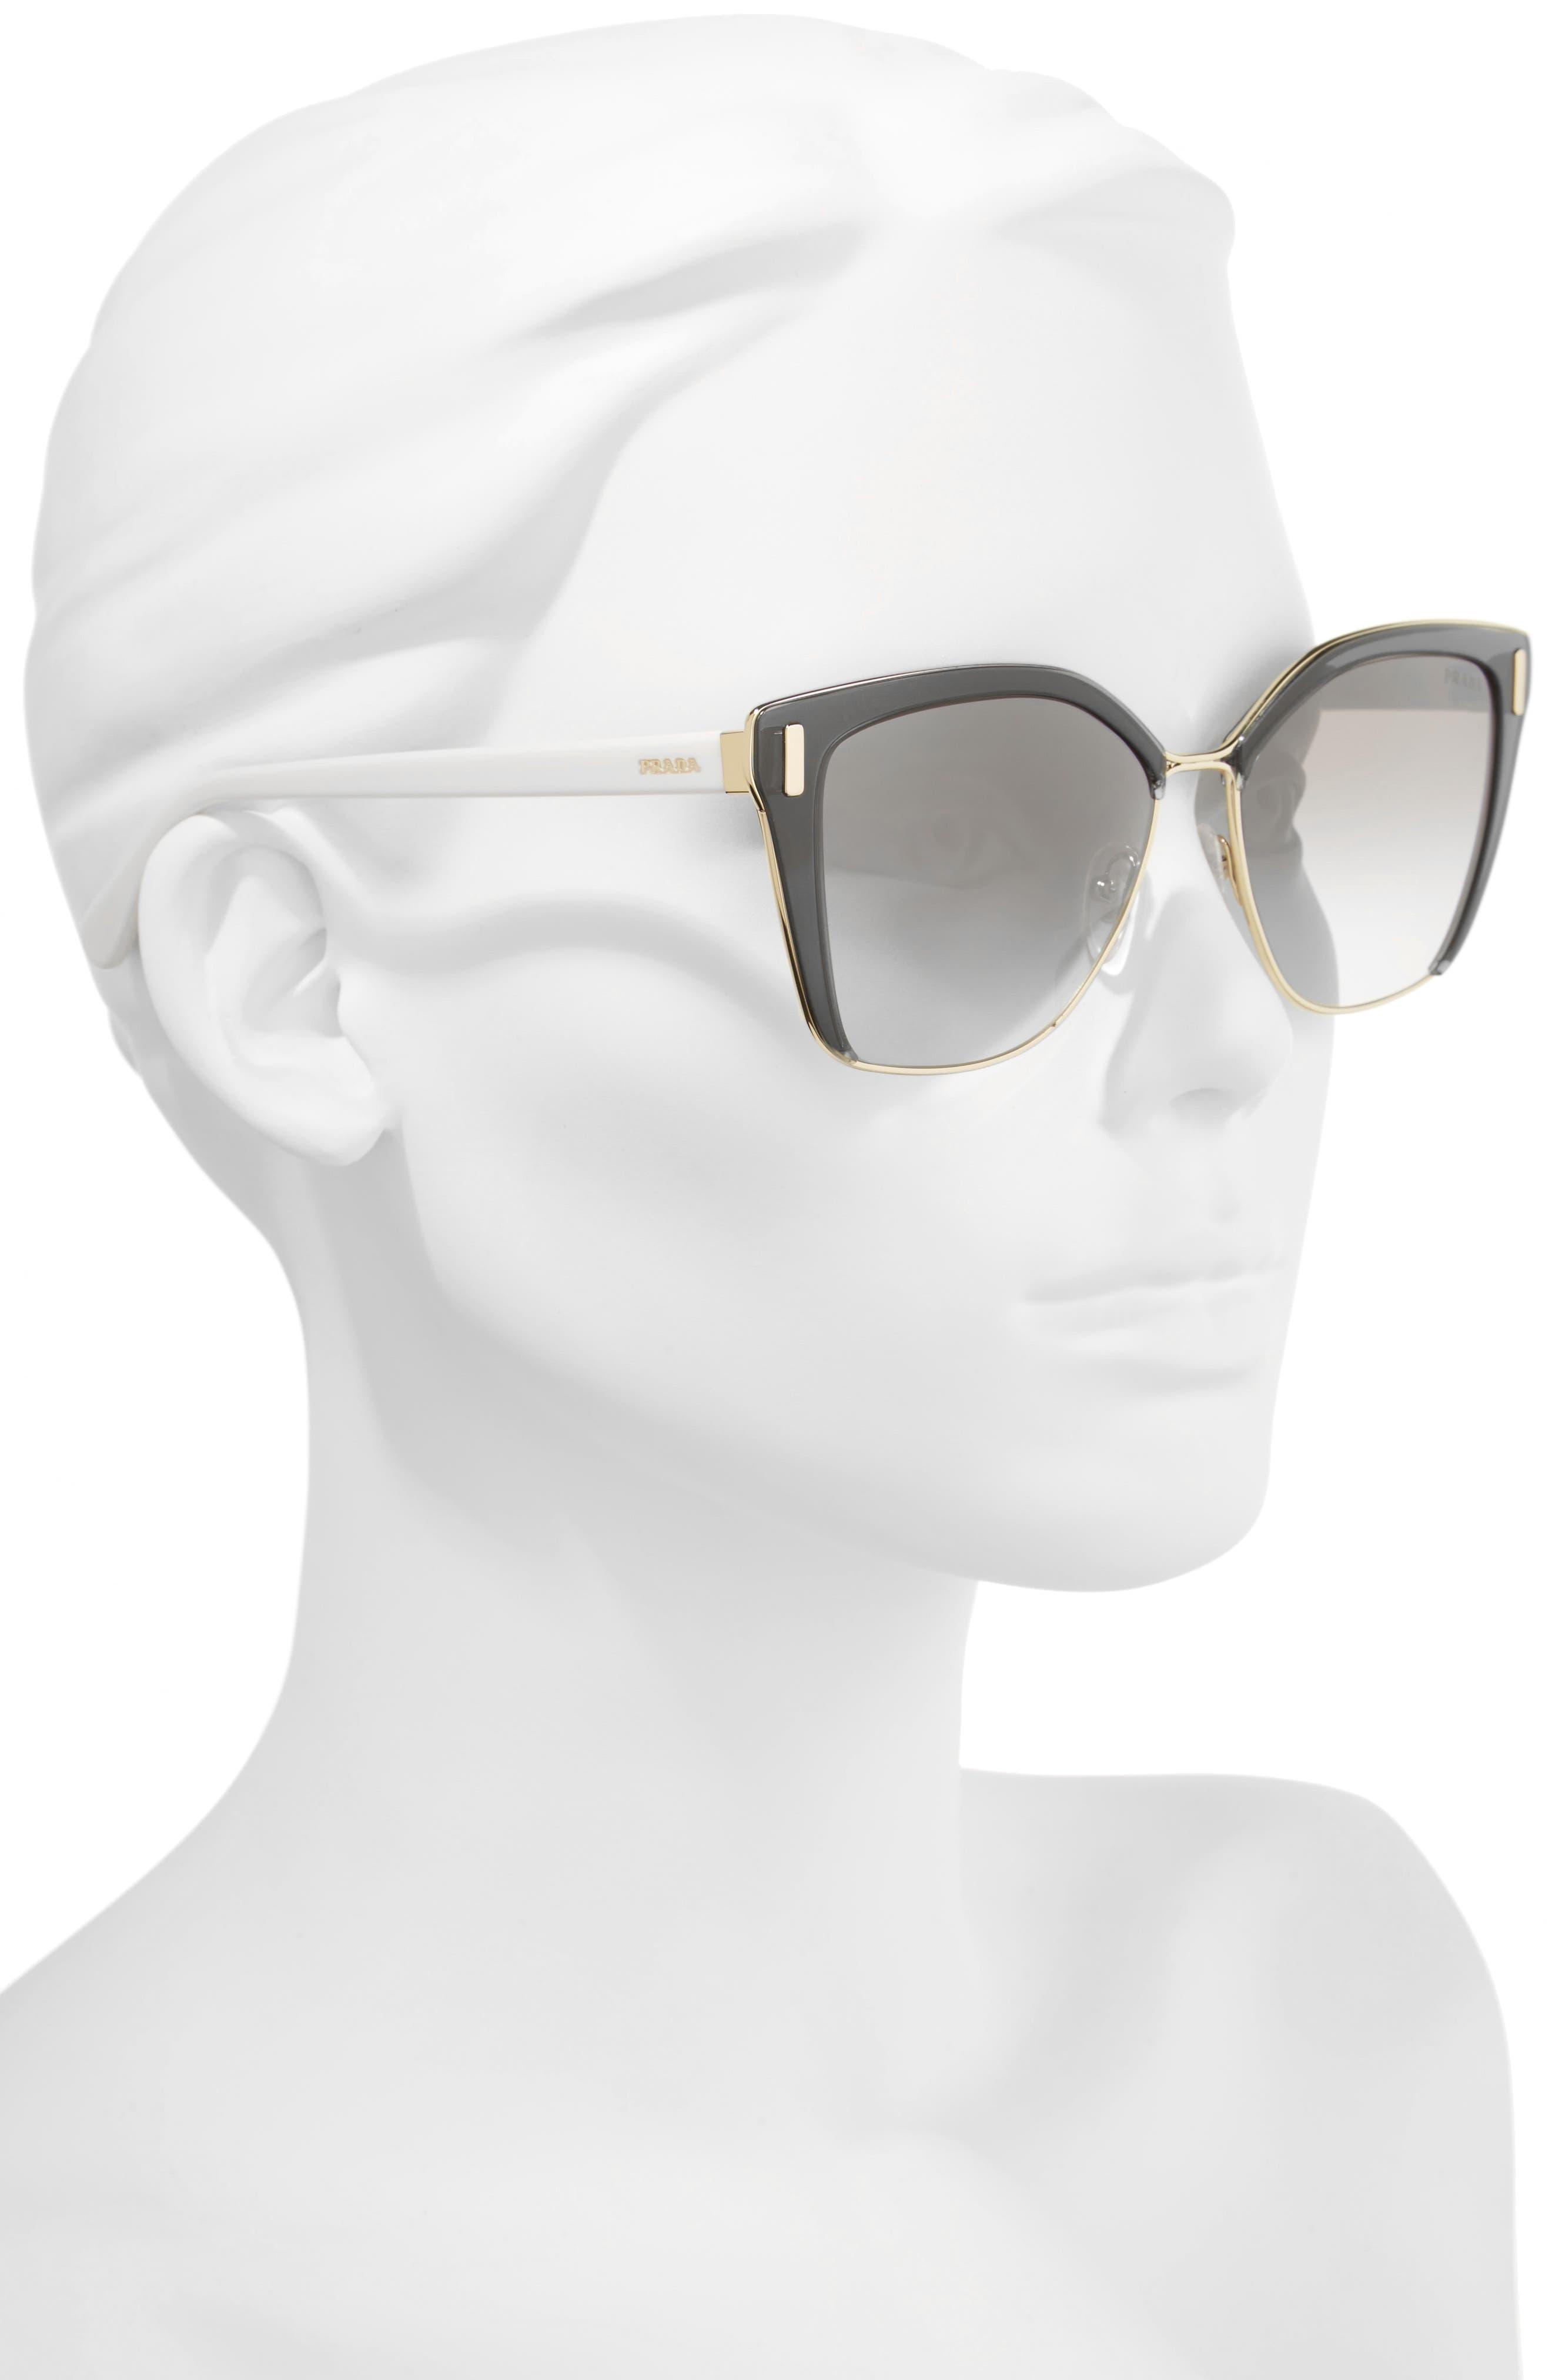 54mm Gradient Geometric Sunglasses,                             Alternate thumbnail 2, color,                             GREY/ GOLD GRADIENT MIRROR